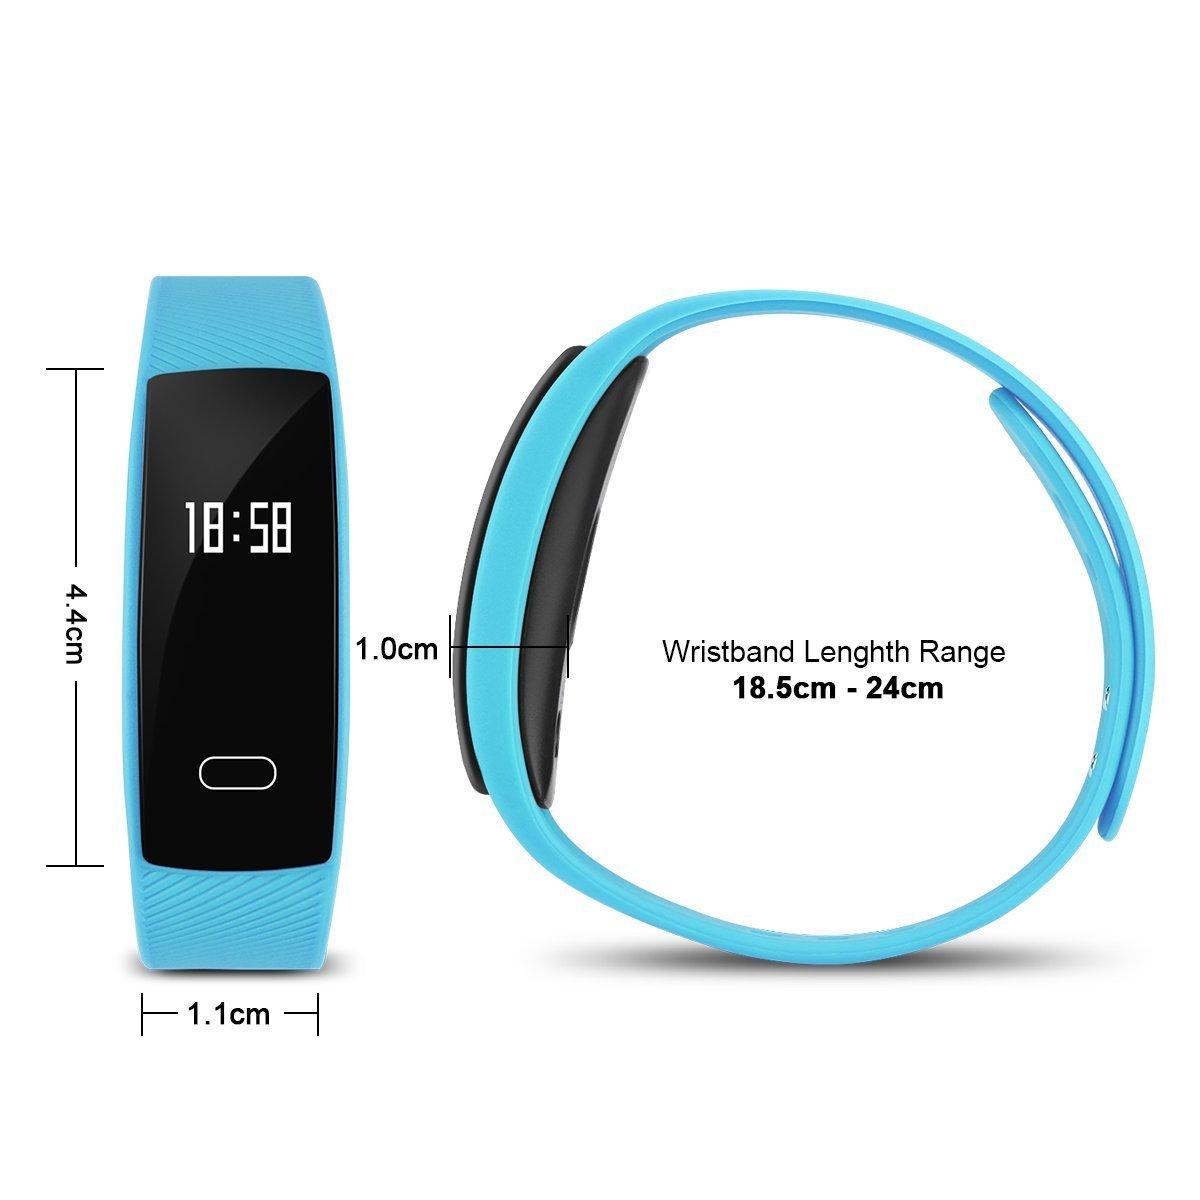 TKSTAR Fitness Tracker Pulsómetro, Smart Watch brazalete deportivo OLED pantalla táctil Smart Reloj de pulsera con Tensiómetro Dormir Monitor calorías ...